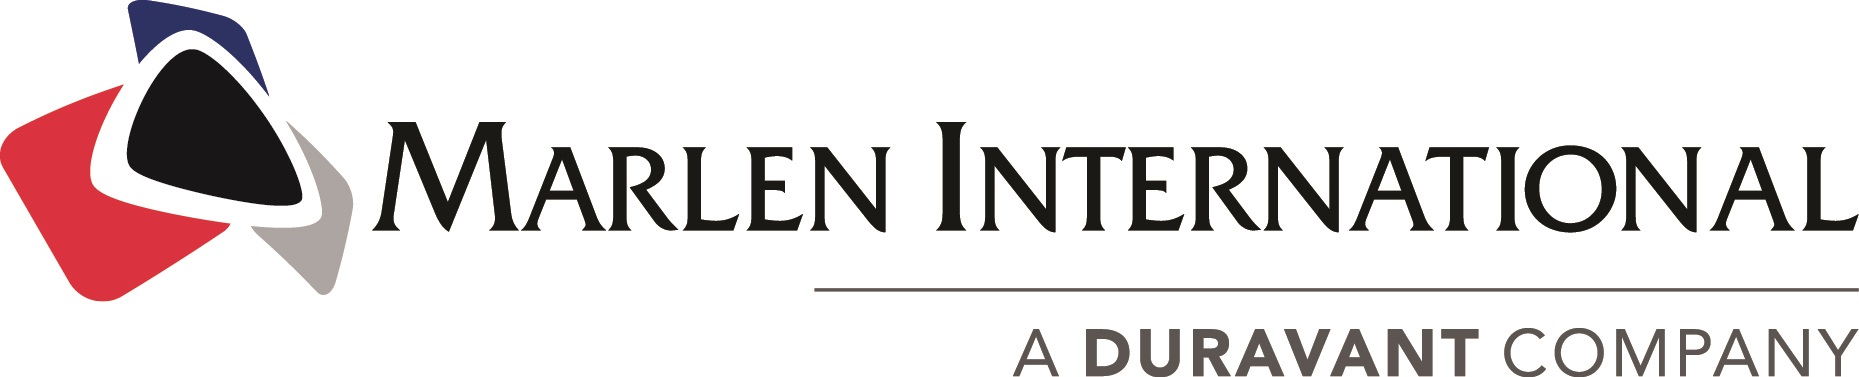 Marlen International 2015.jpg